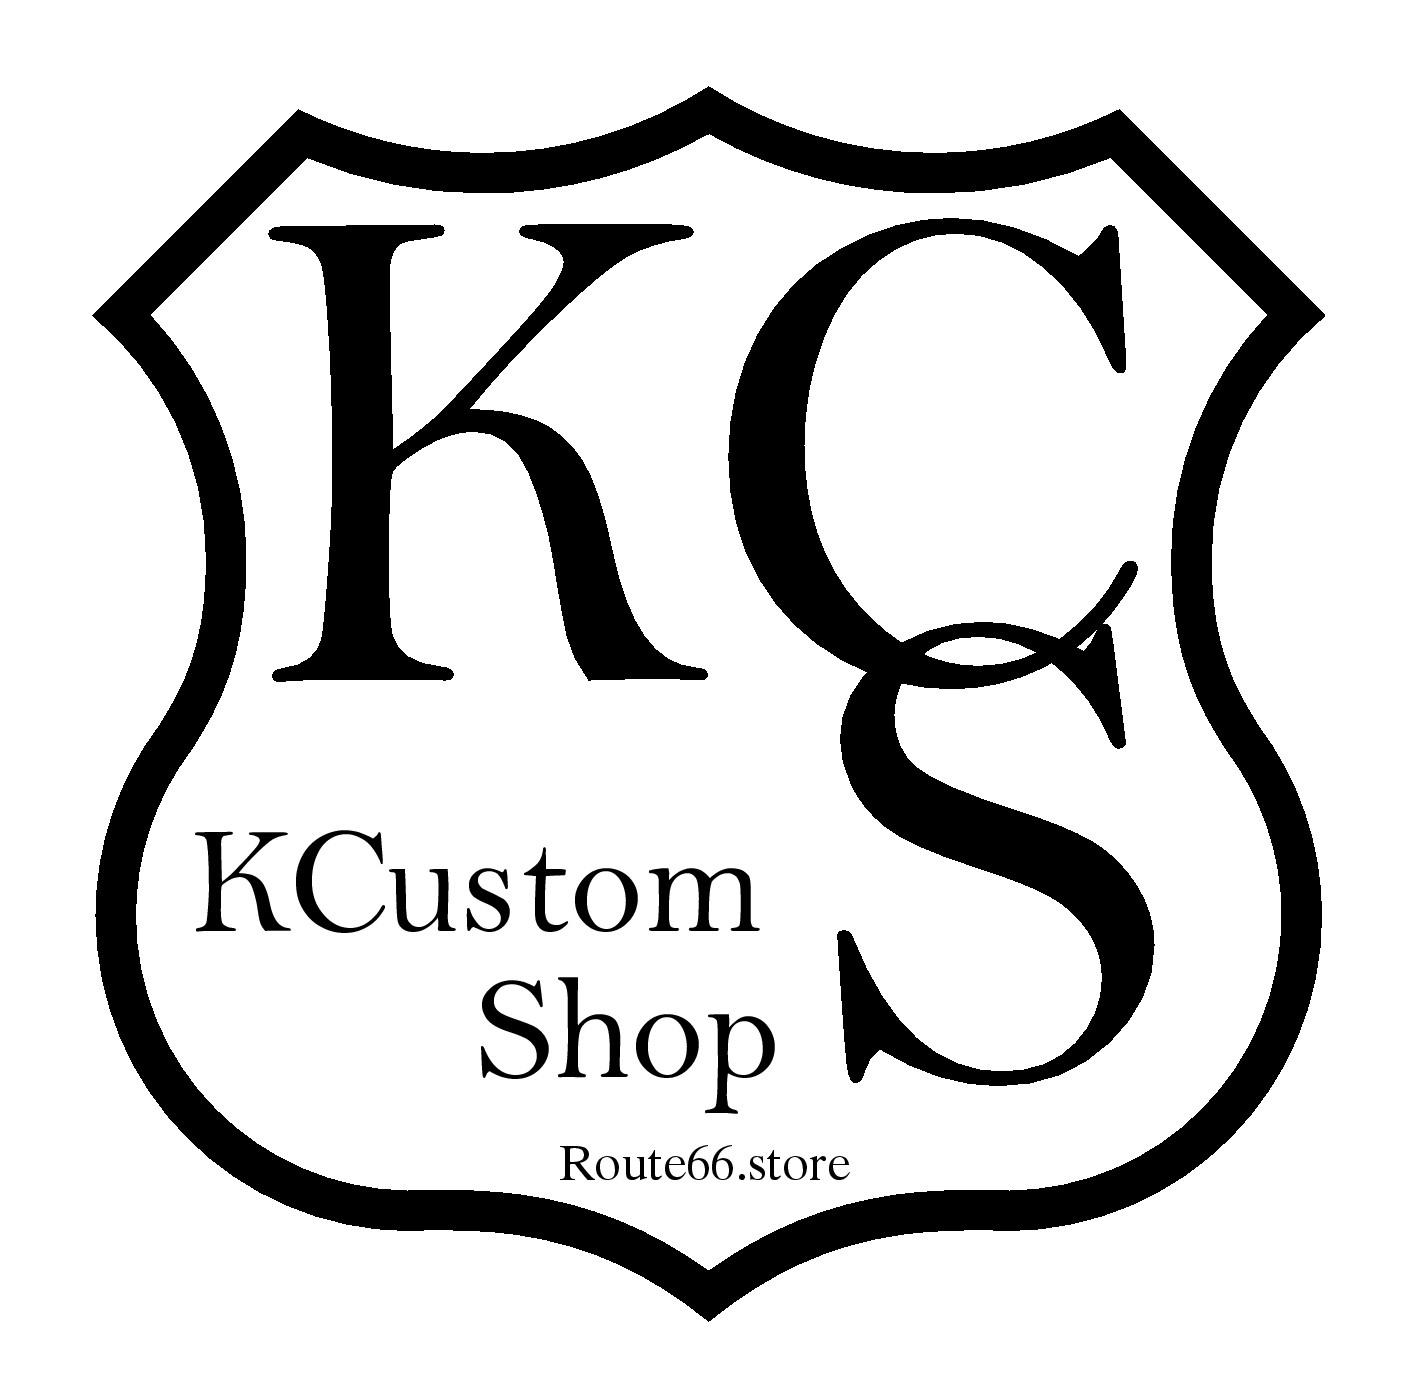 Custom Shop Route 66